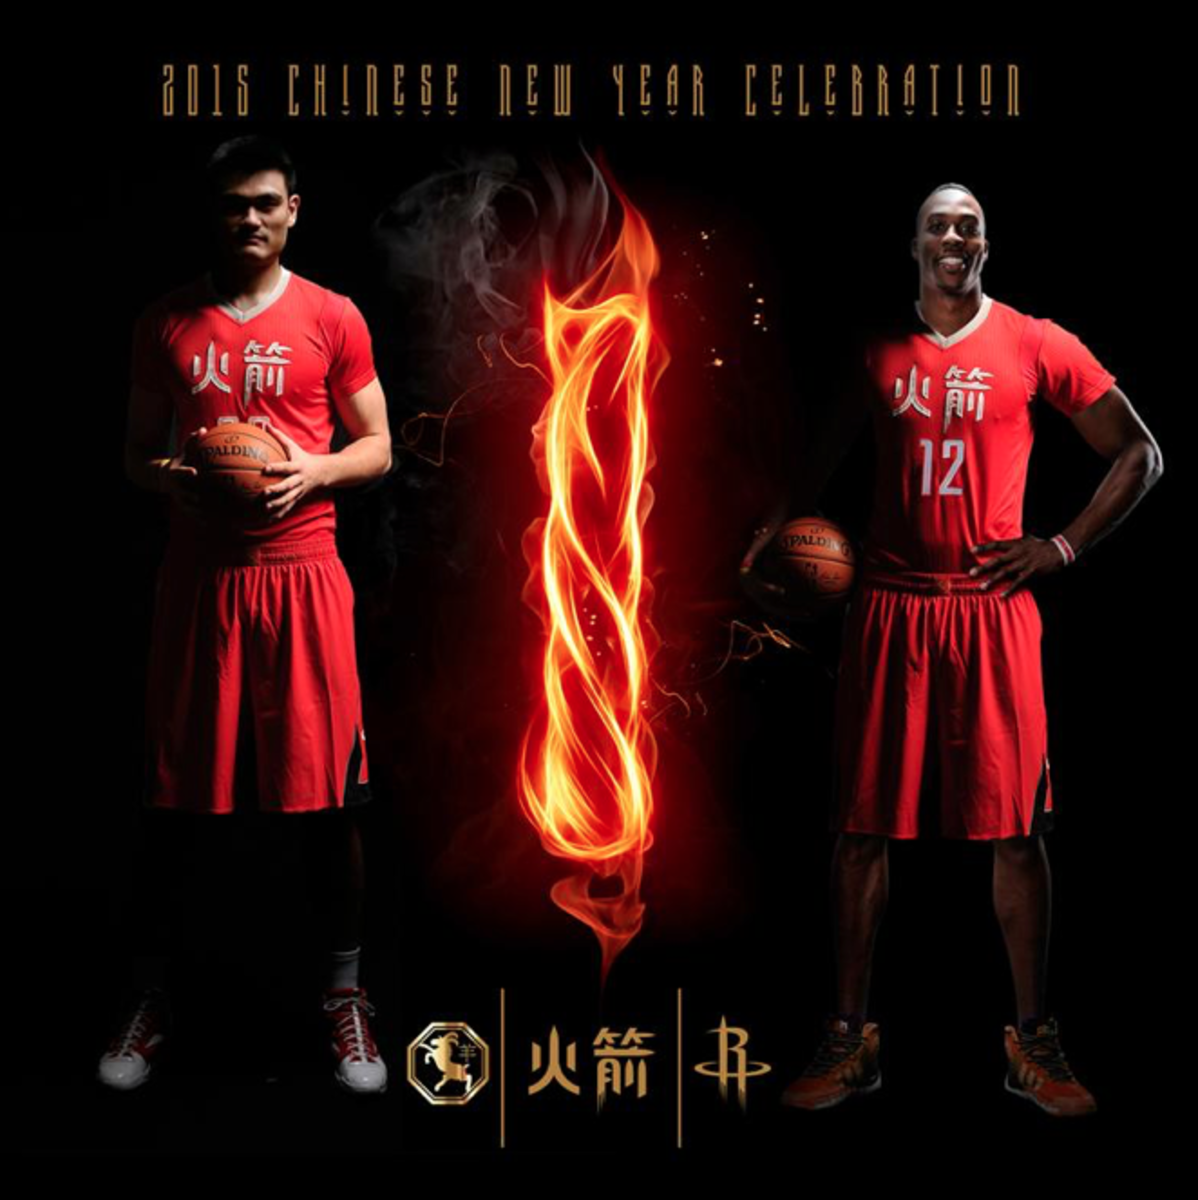 Houston Rockets Chinese New Year Uniforms